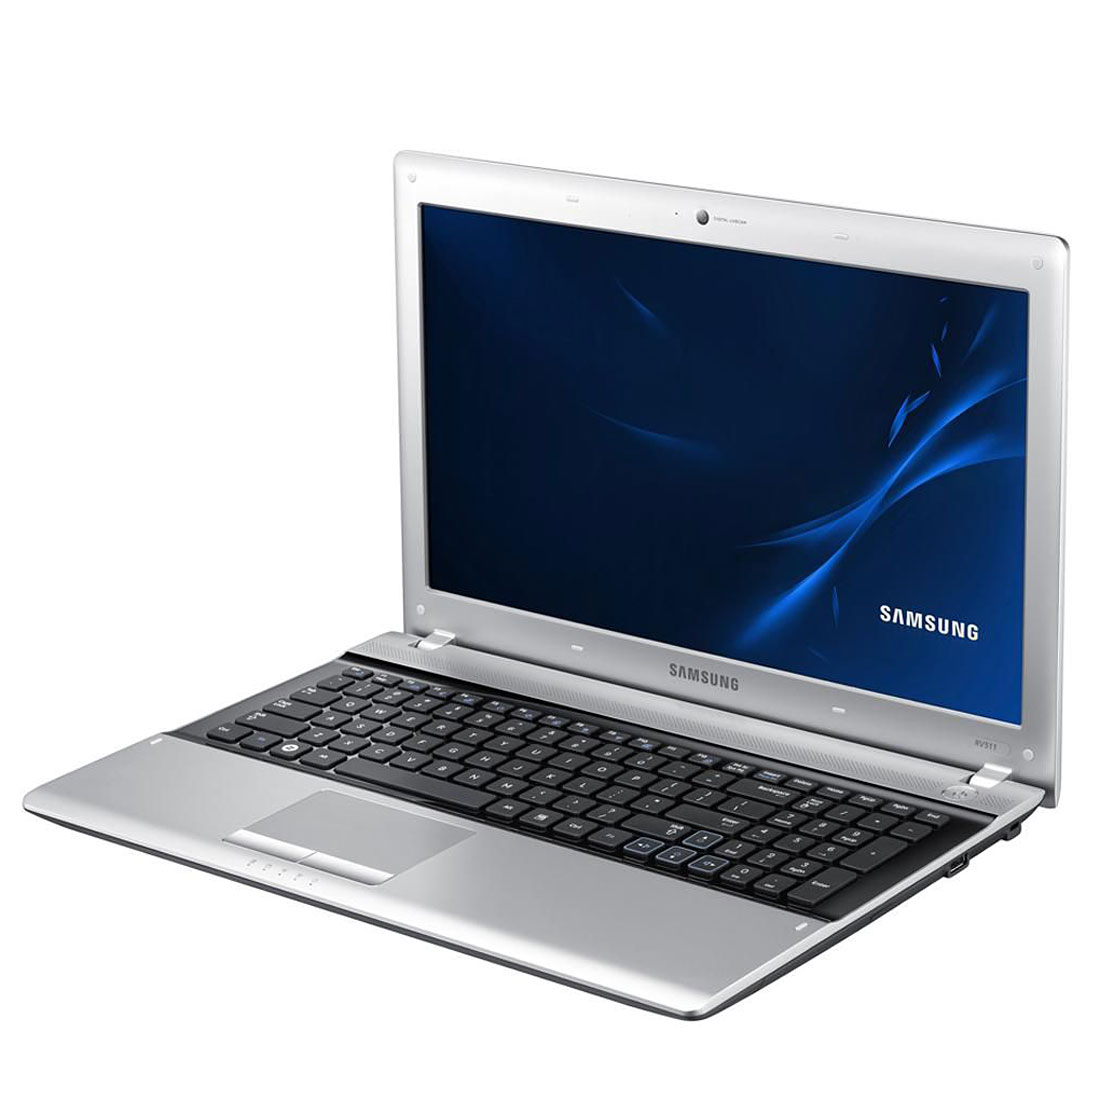 "PC portable Samsung RV515 E7P-350 AMD Double-Coeur E350 4 Go 500 Go 15.6"" LED AMD Radeon HD 6470M Graveur DVD Wi-Fi N Webcam Windows 7 Premium 64 bits"